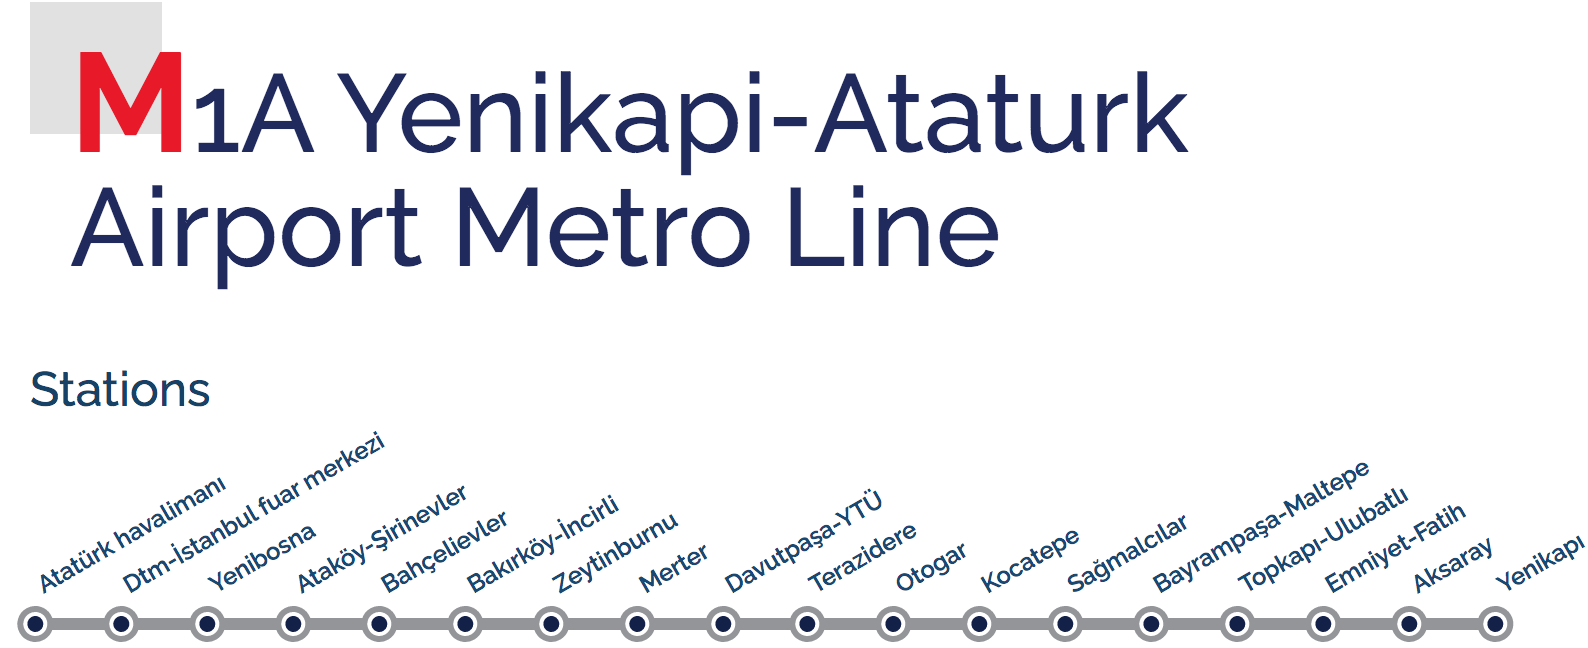 Маршруты метро M1А